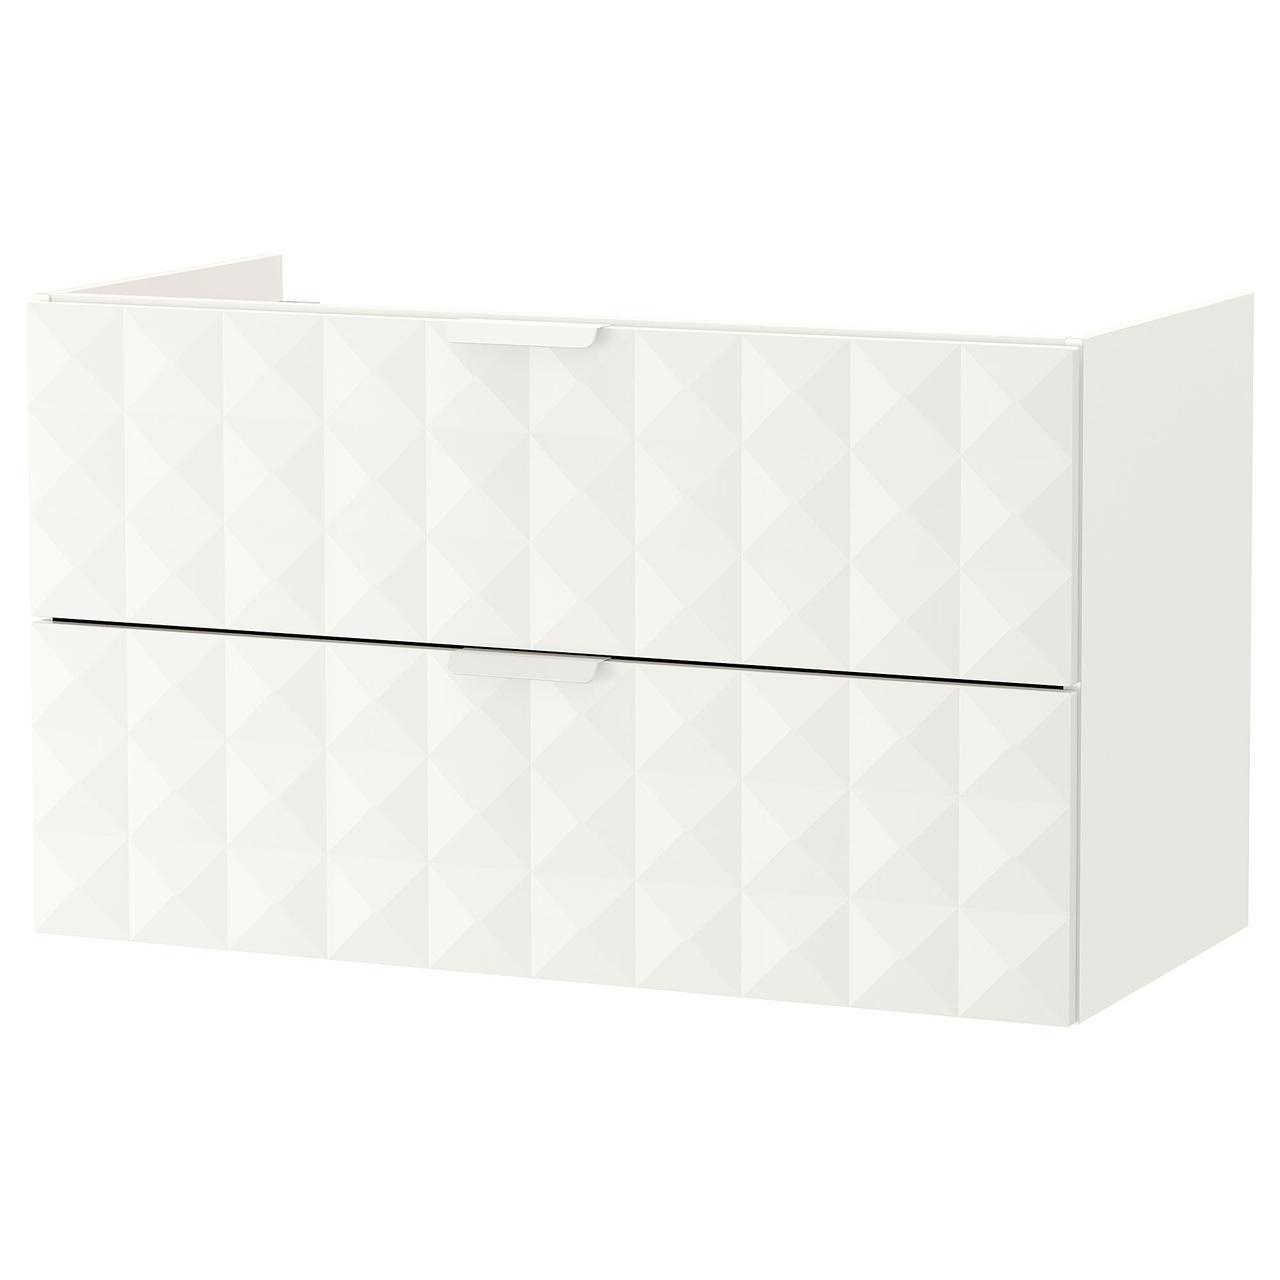 Шкаф для раковины IKEA GODMORGON 403.909.88